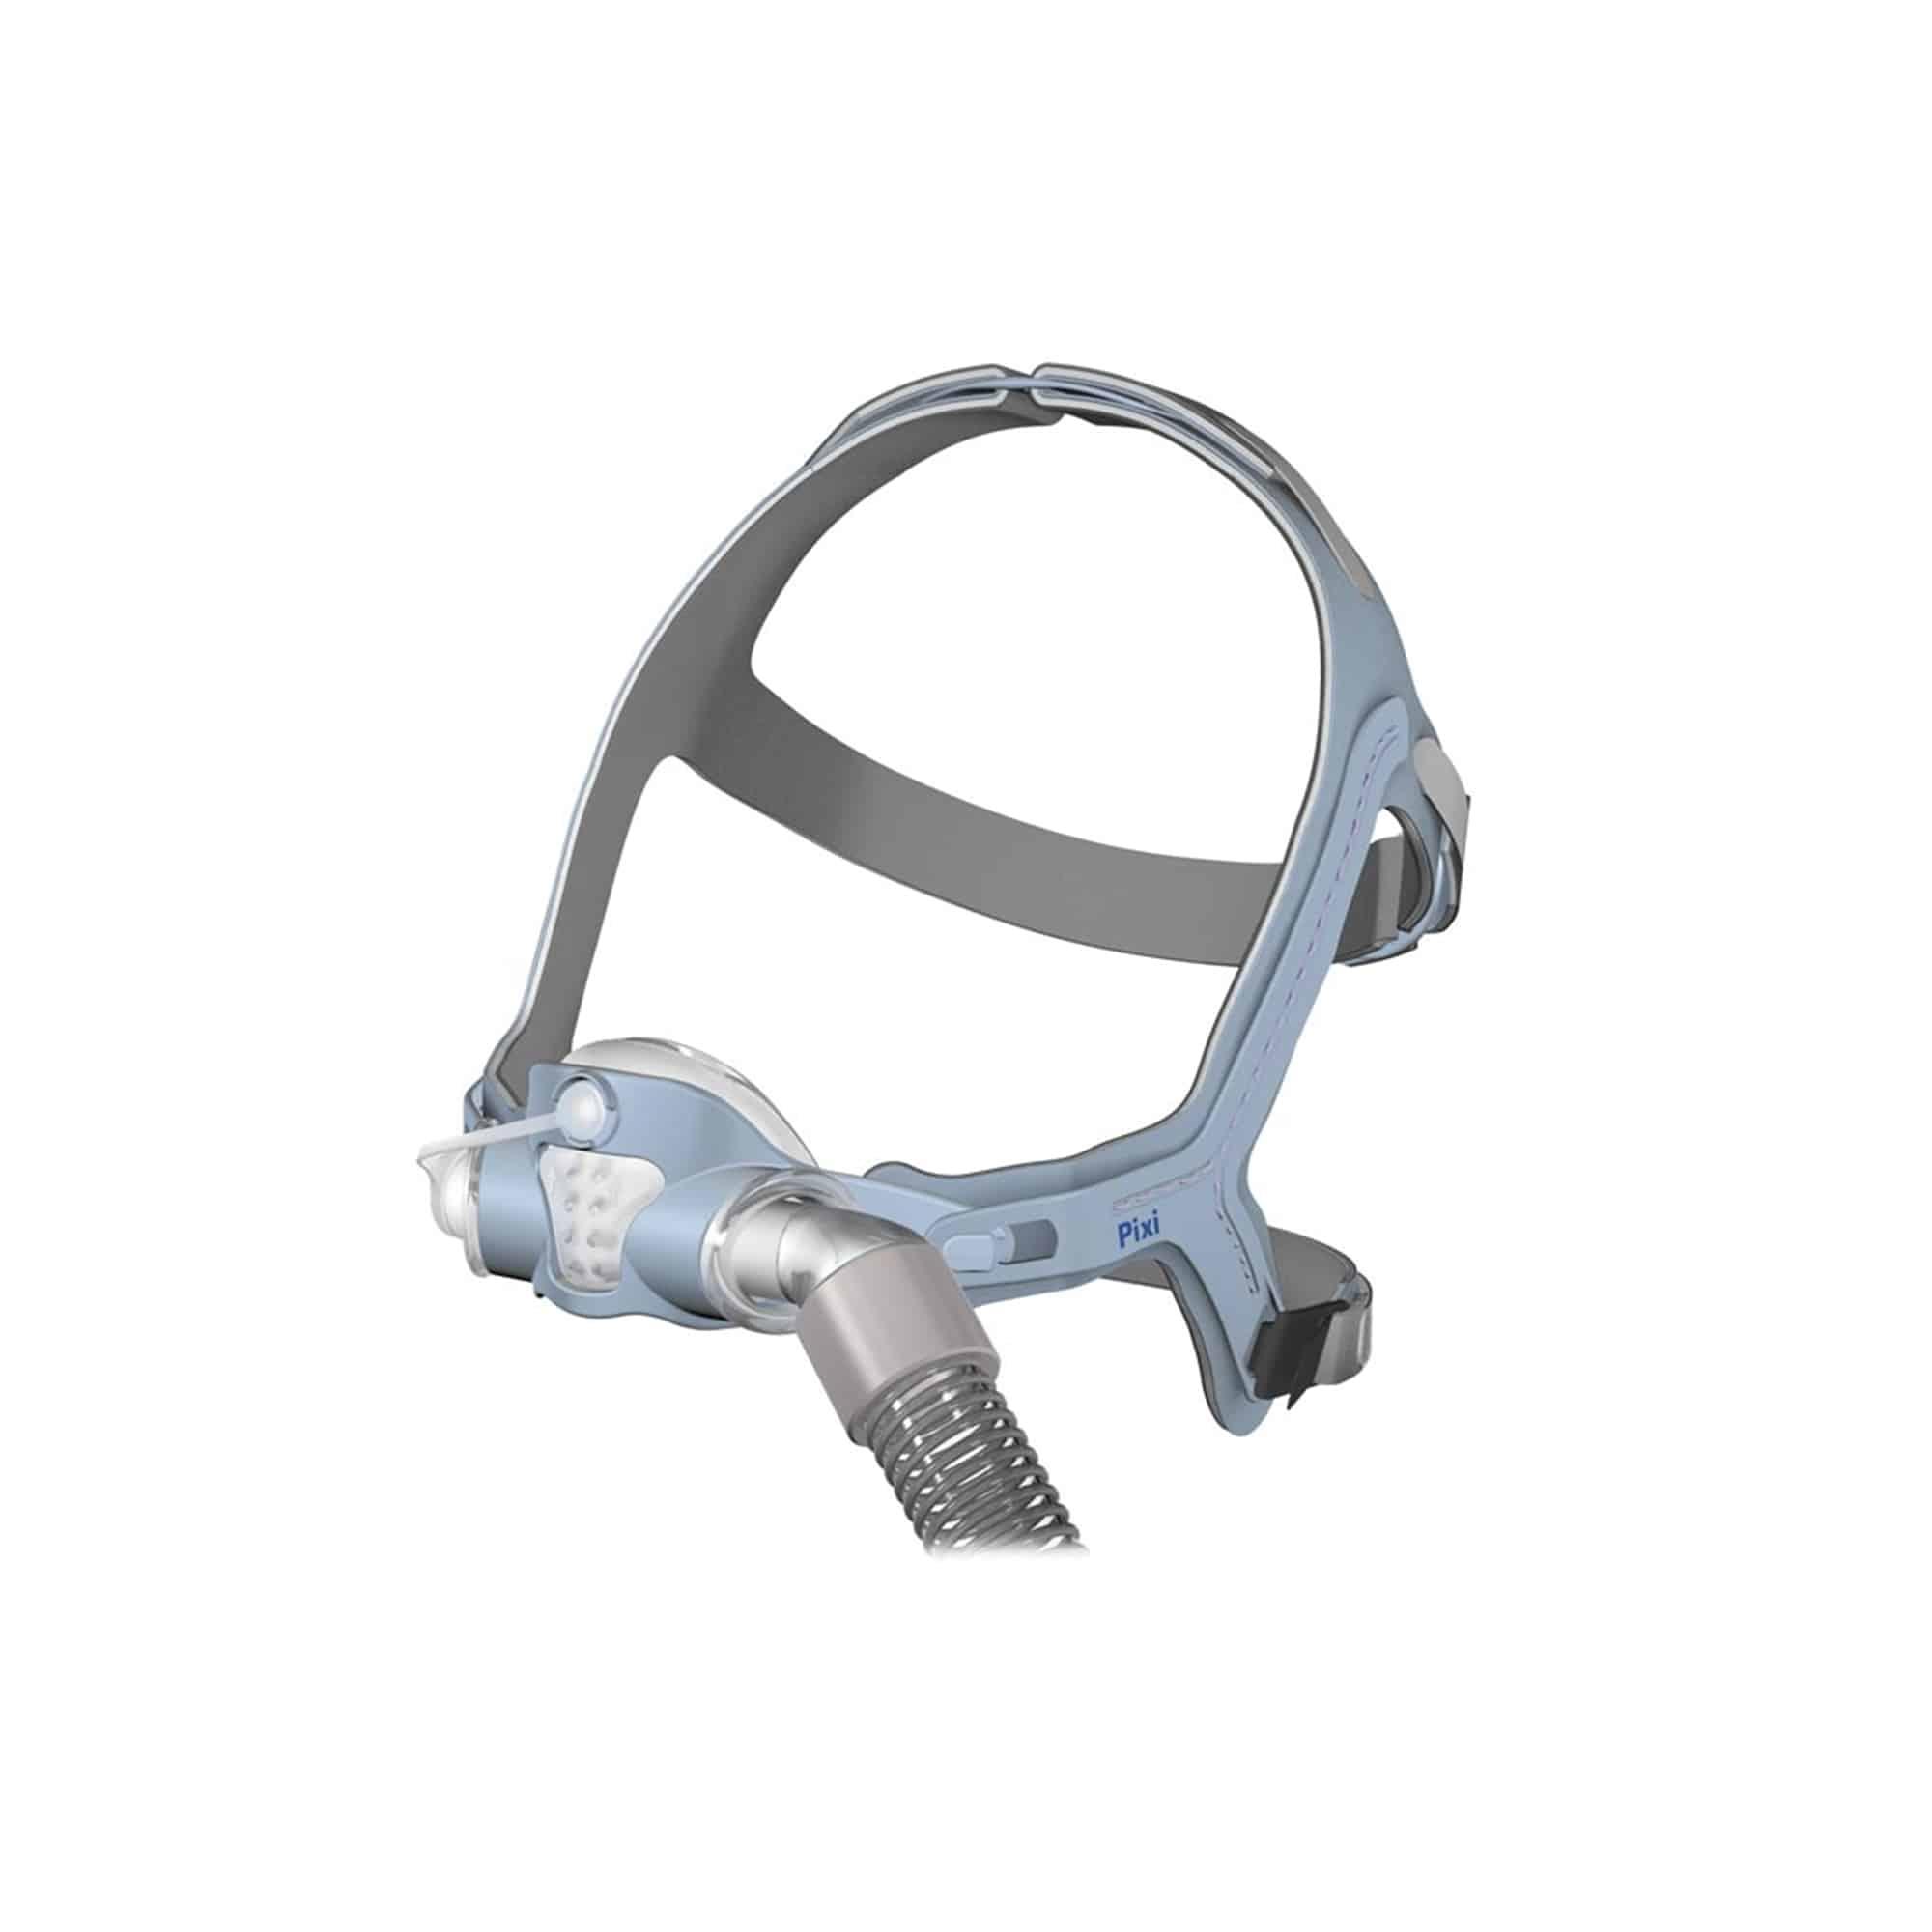 Pixi pediatric nasal mask ResMed